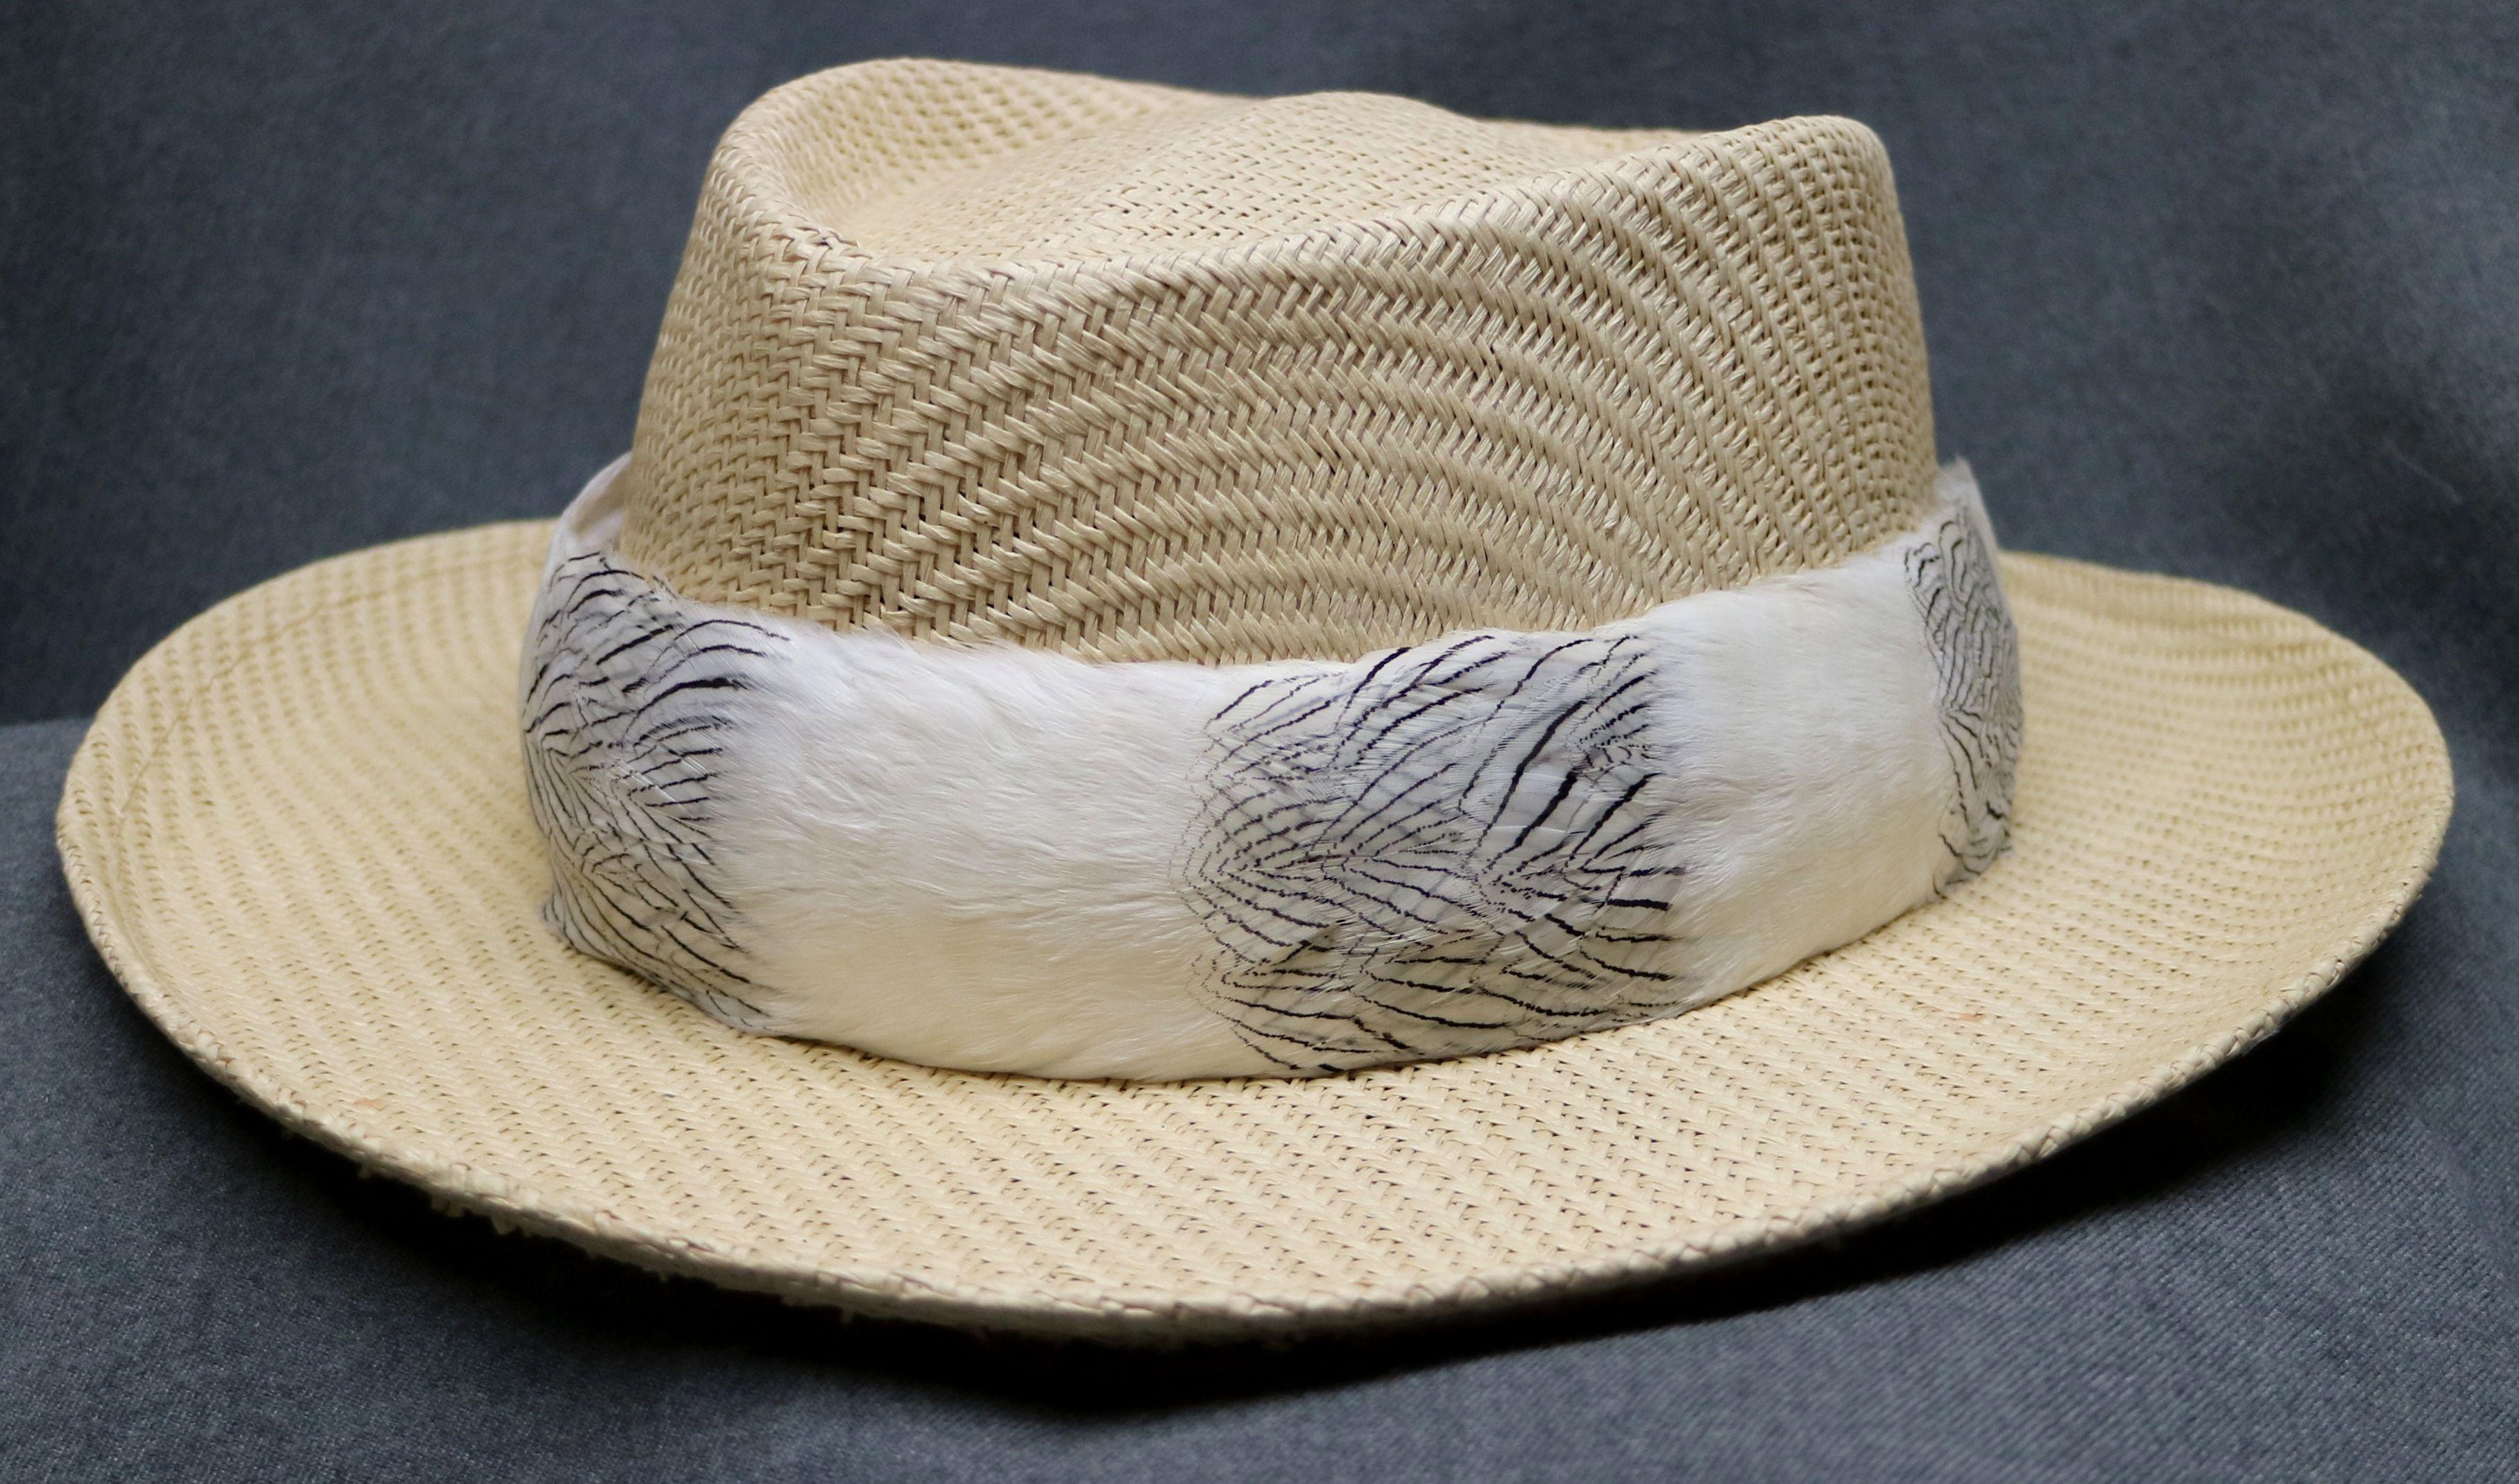 Pin On Lei Hulu Hawaiian Feather Lei And Hat Bands